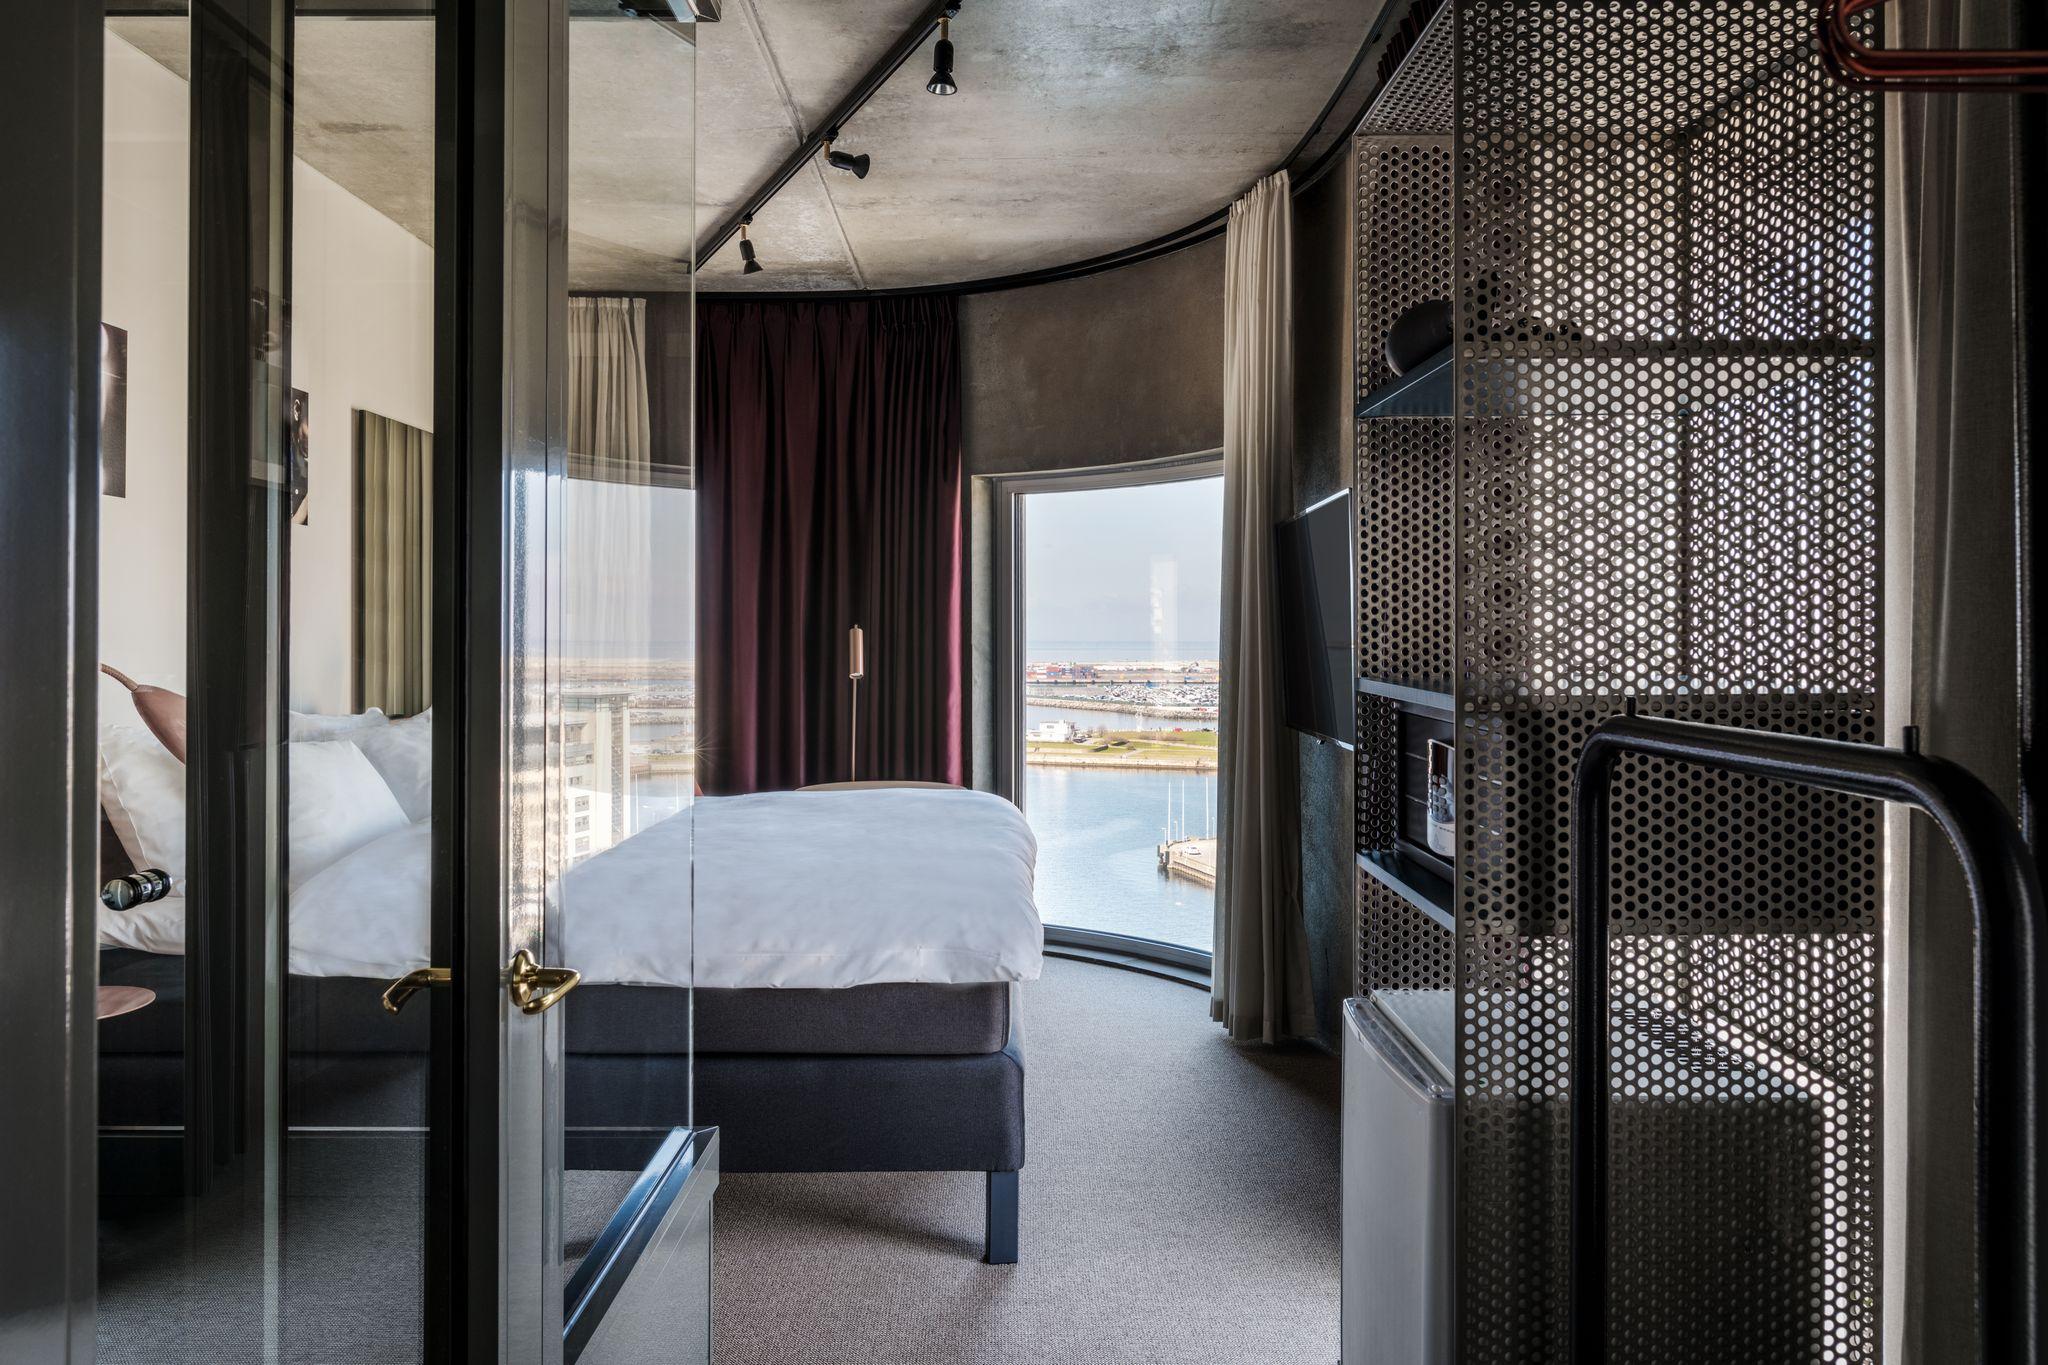 Hyatt eröffnet drei Hotels der Marke Jdv